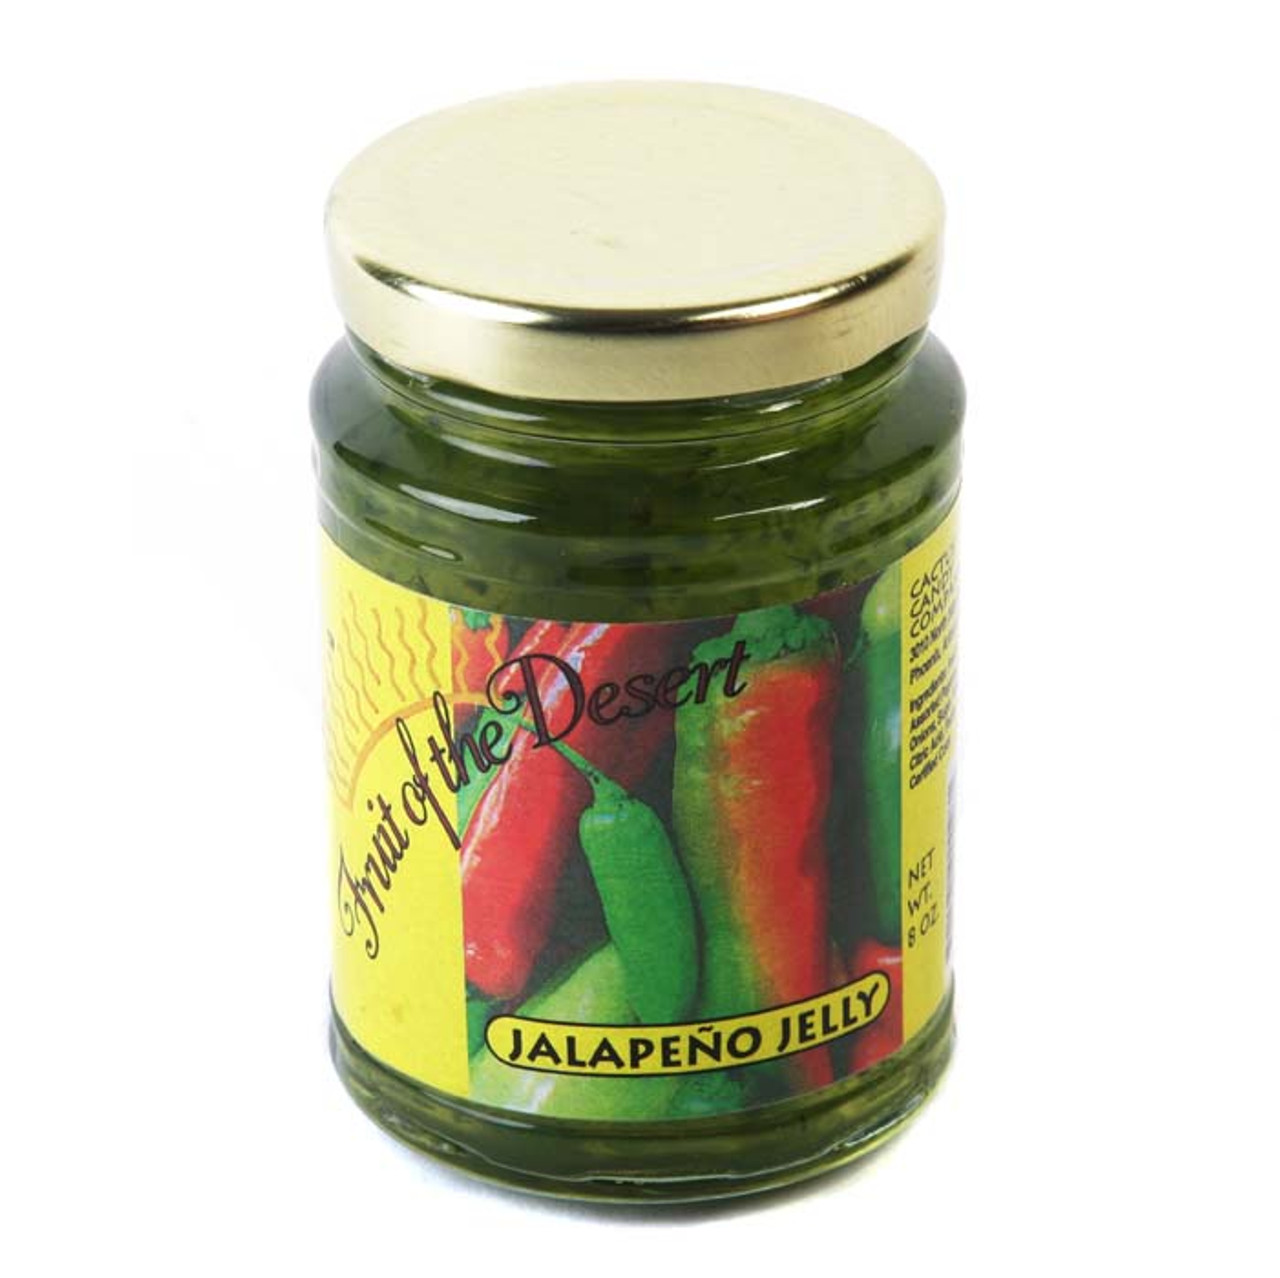 Gourmet Jalapeno Jelly 8oz-Case of 12